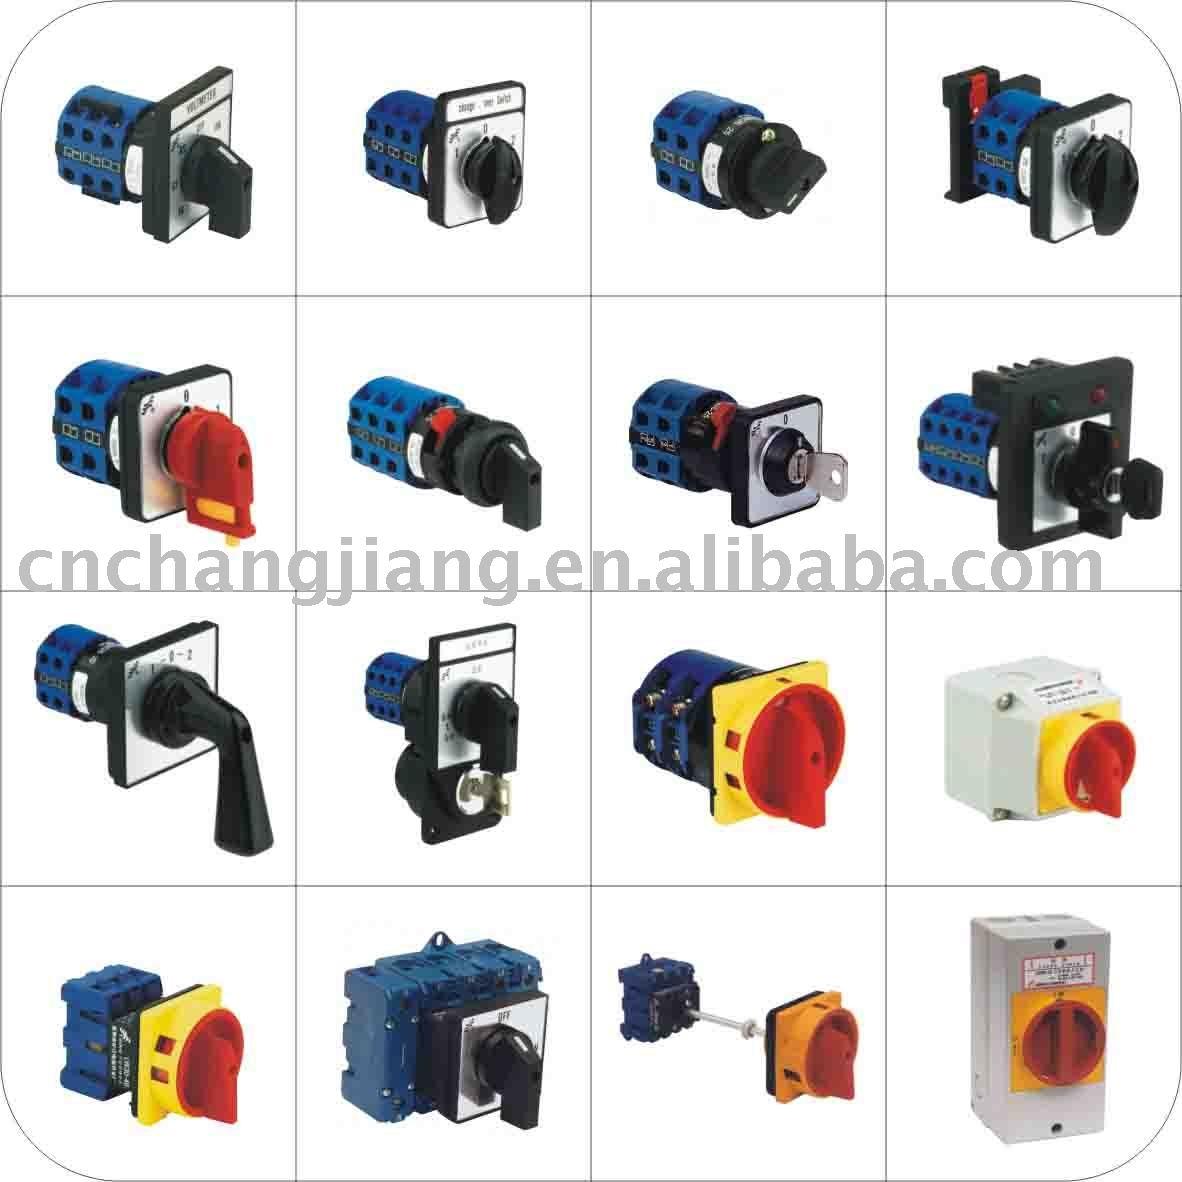 Rotary Switch (CE Certification)(China (Mainland))